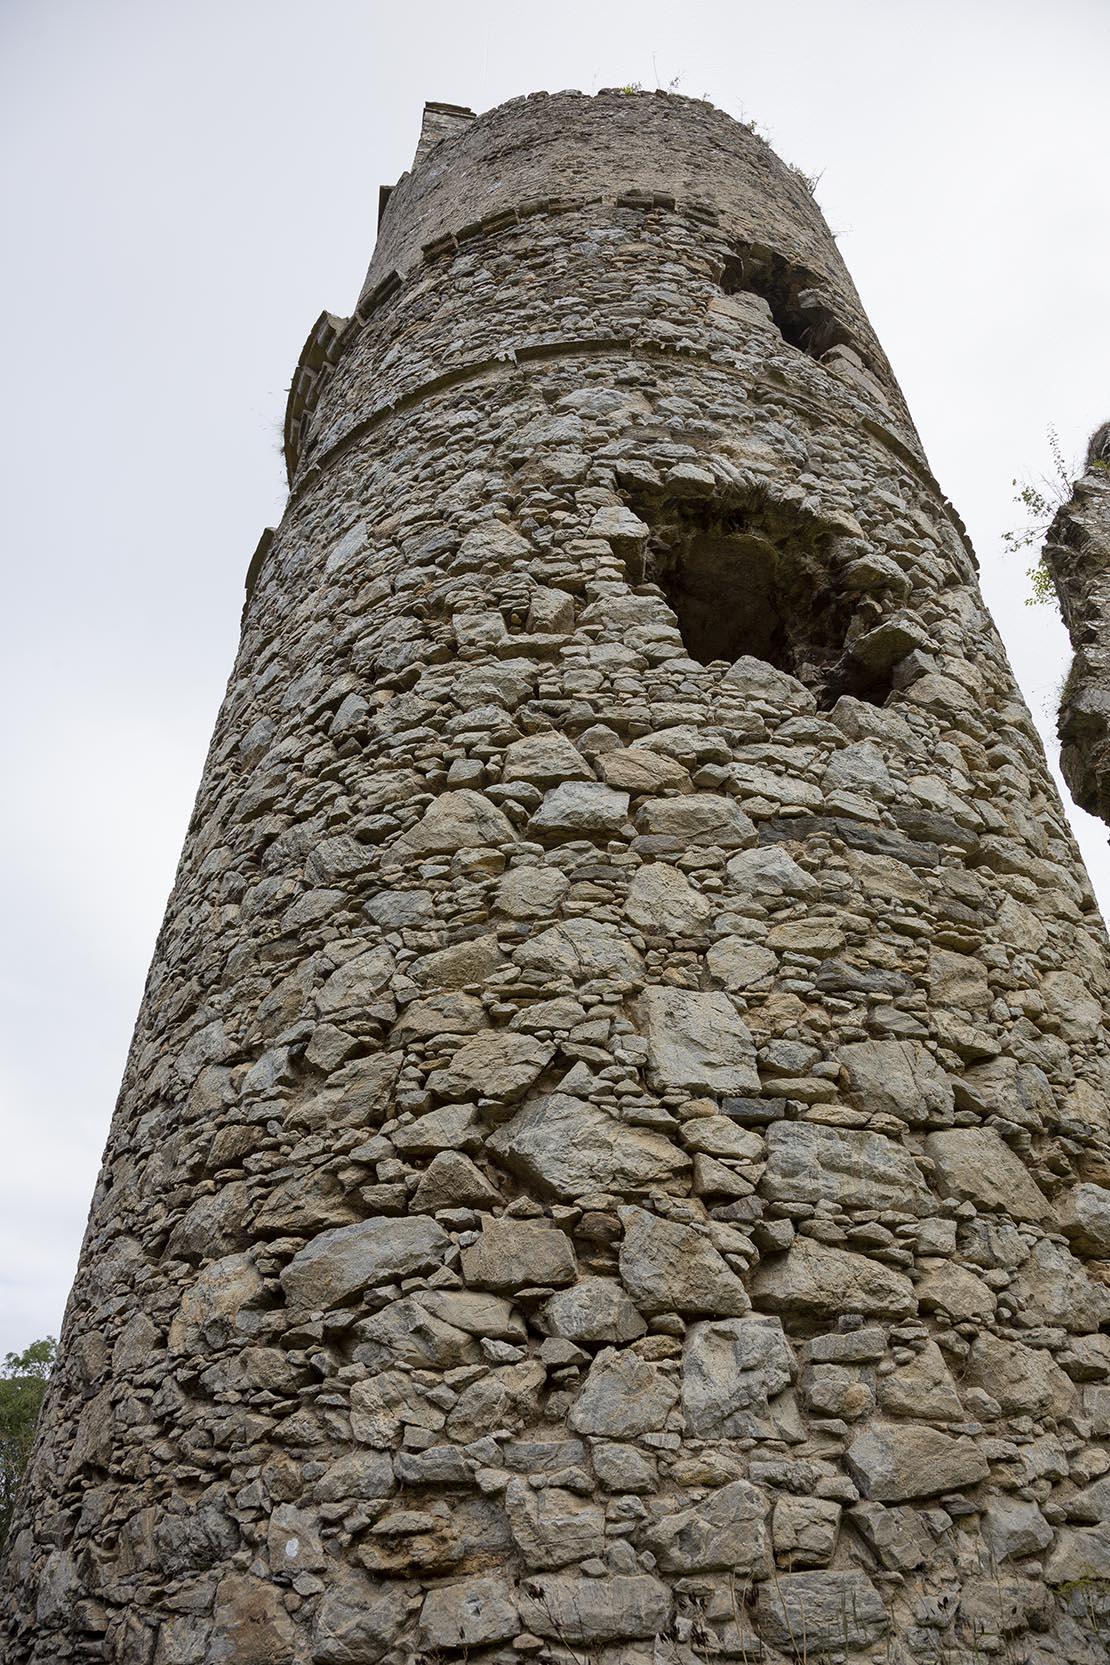 Boyne Castle near Portsoy, Aberdeenshire